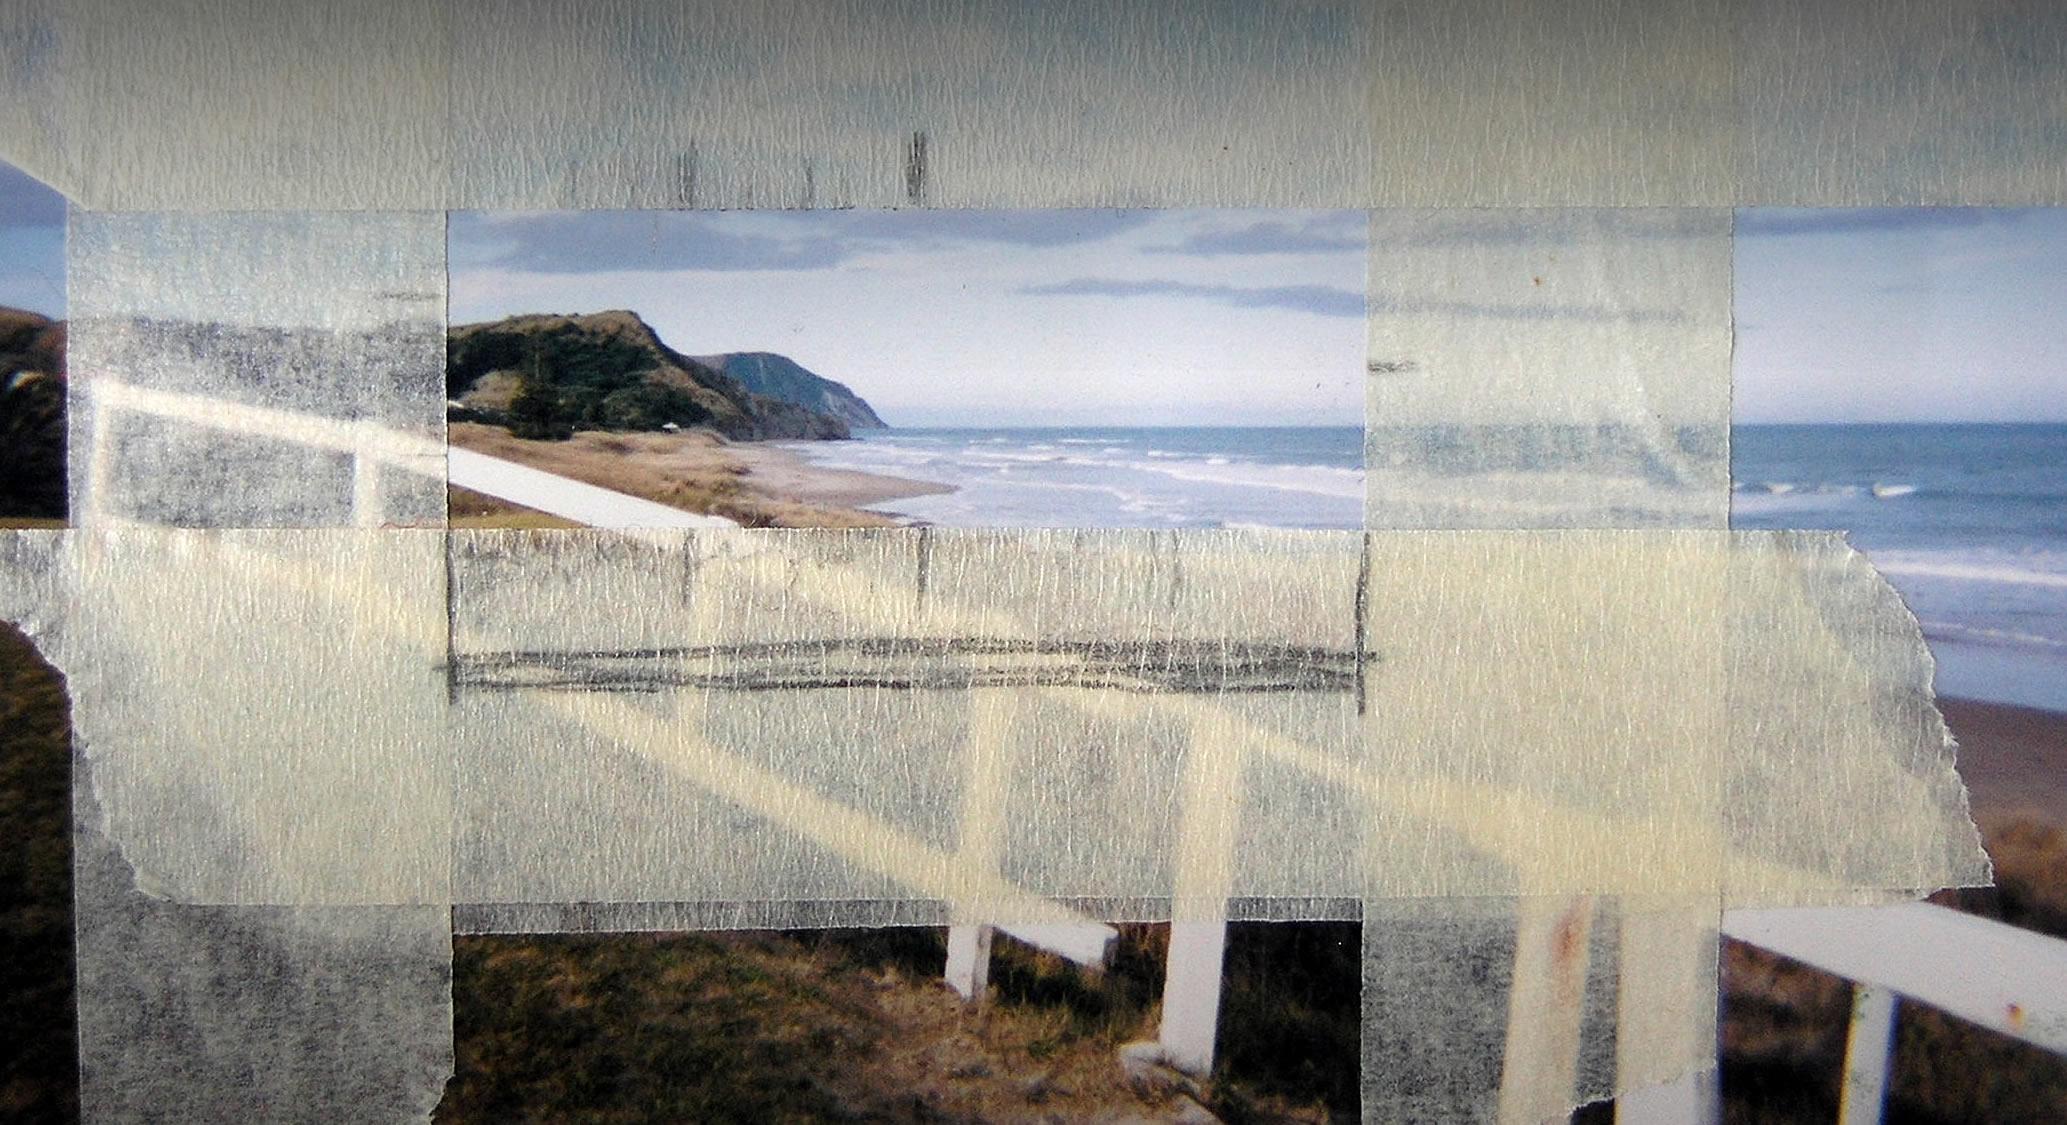 Beach paintings by Amiria Gale